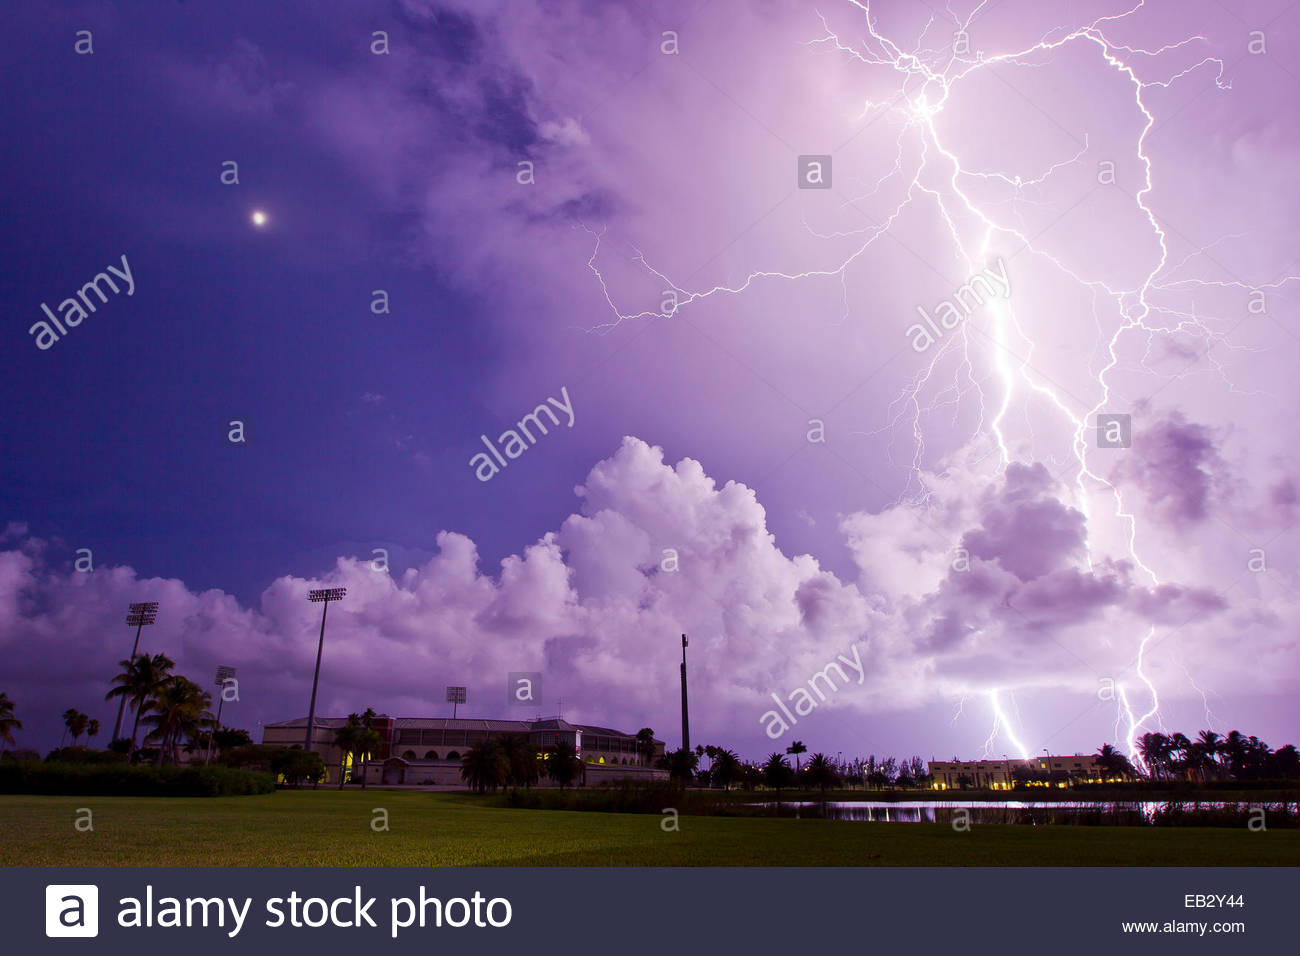 An intense lightning storm lights the sky purple at night. - Stock Image